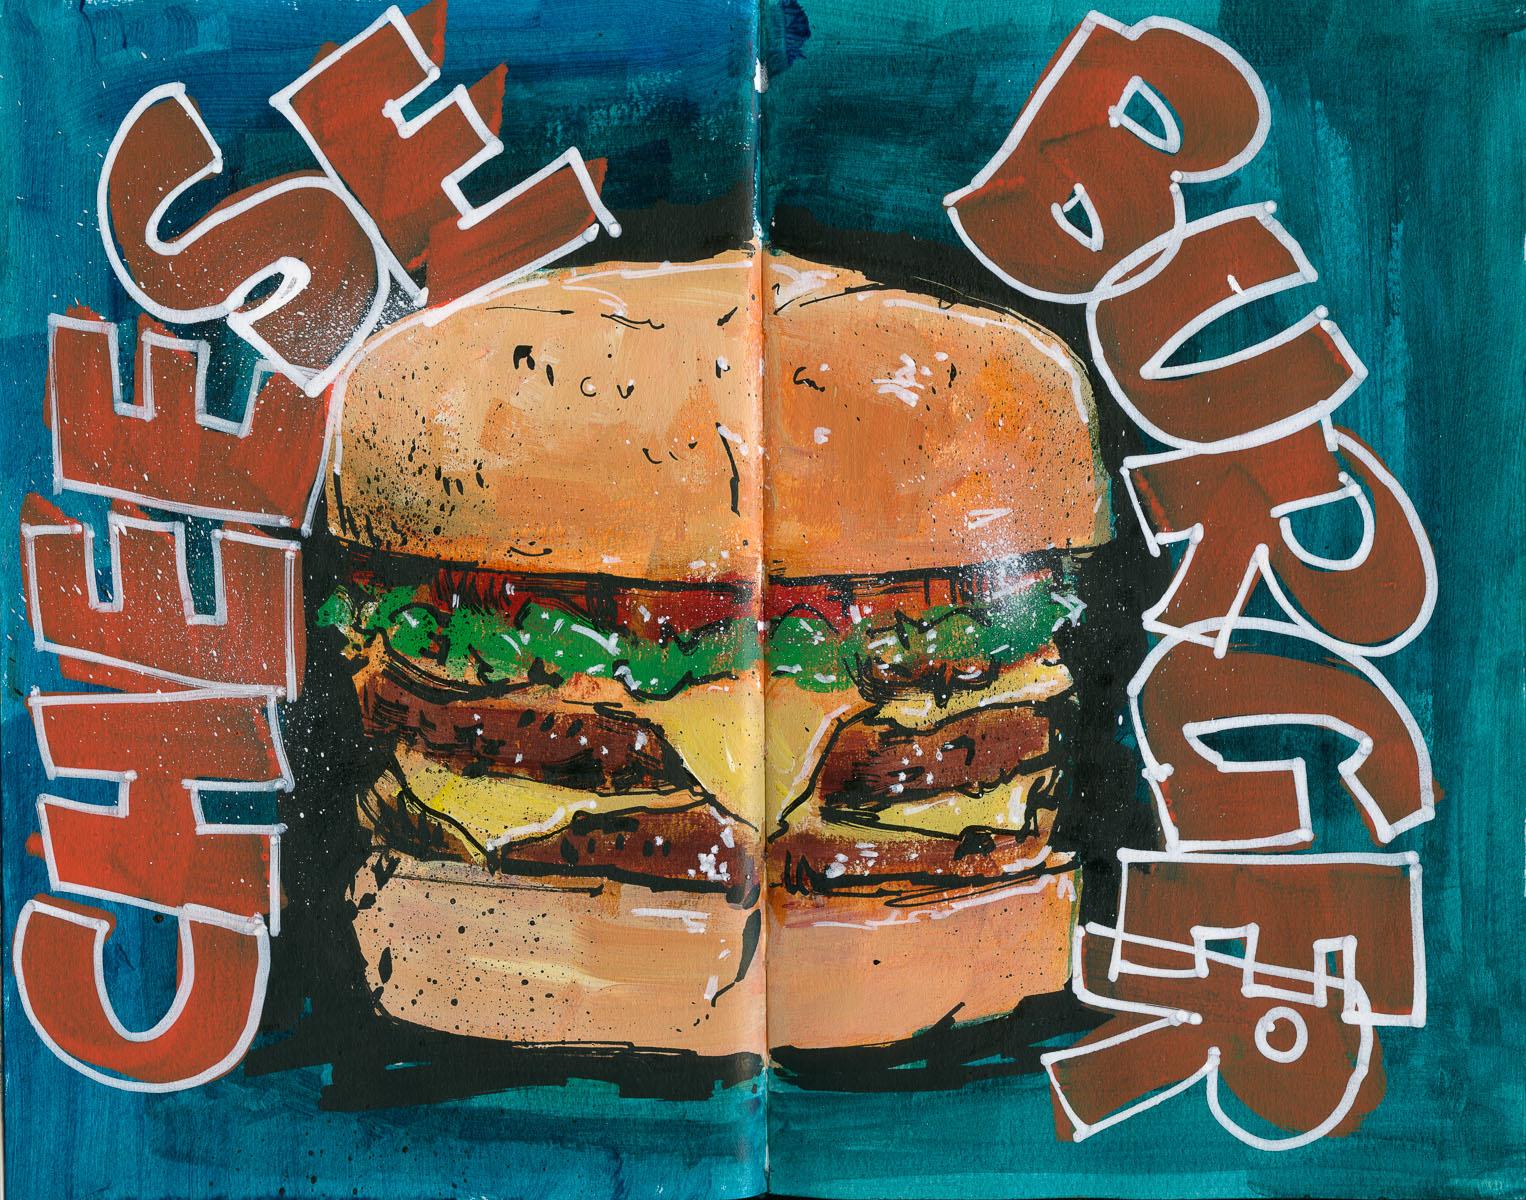 Cannon Pearson–Sketchbook: Cheeseburger